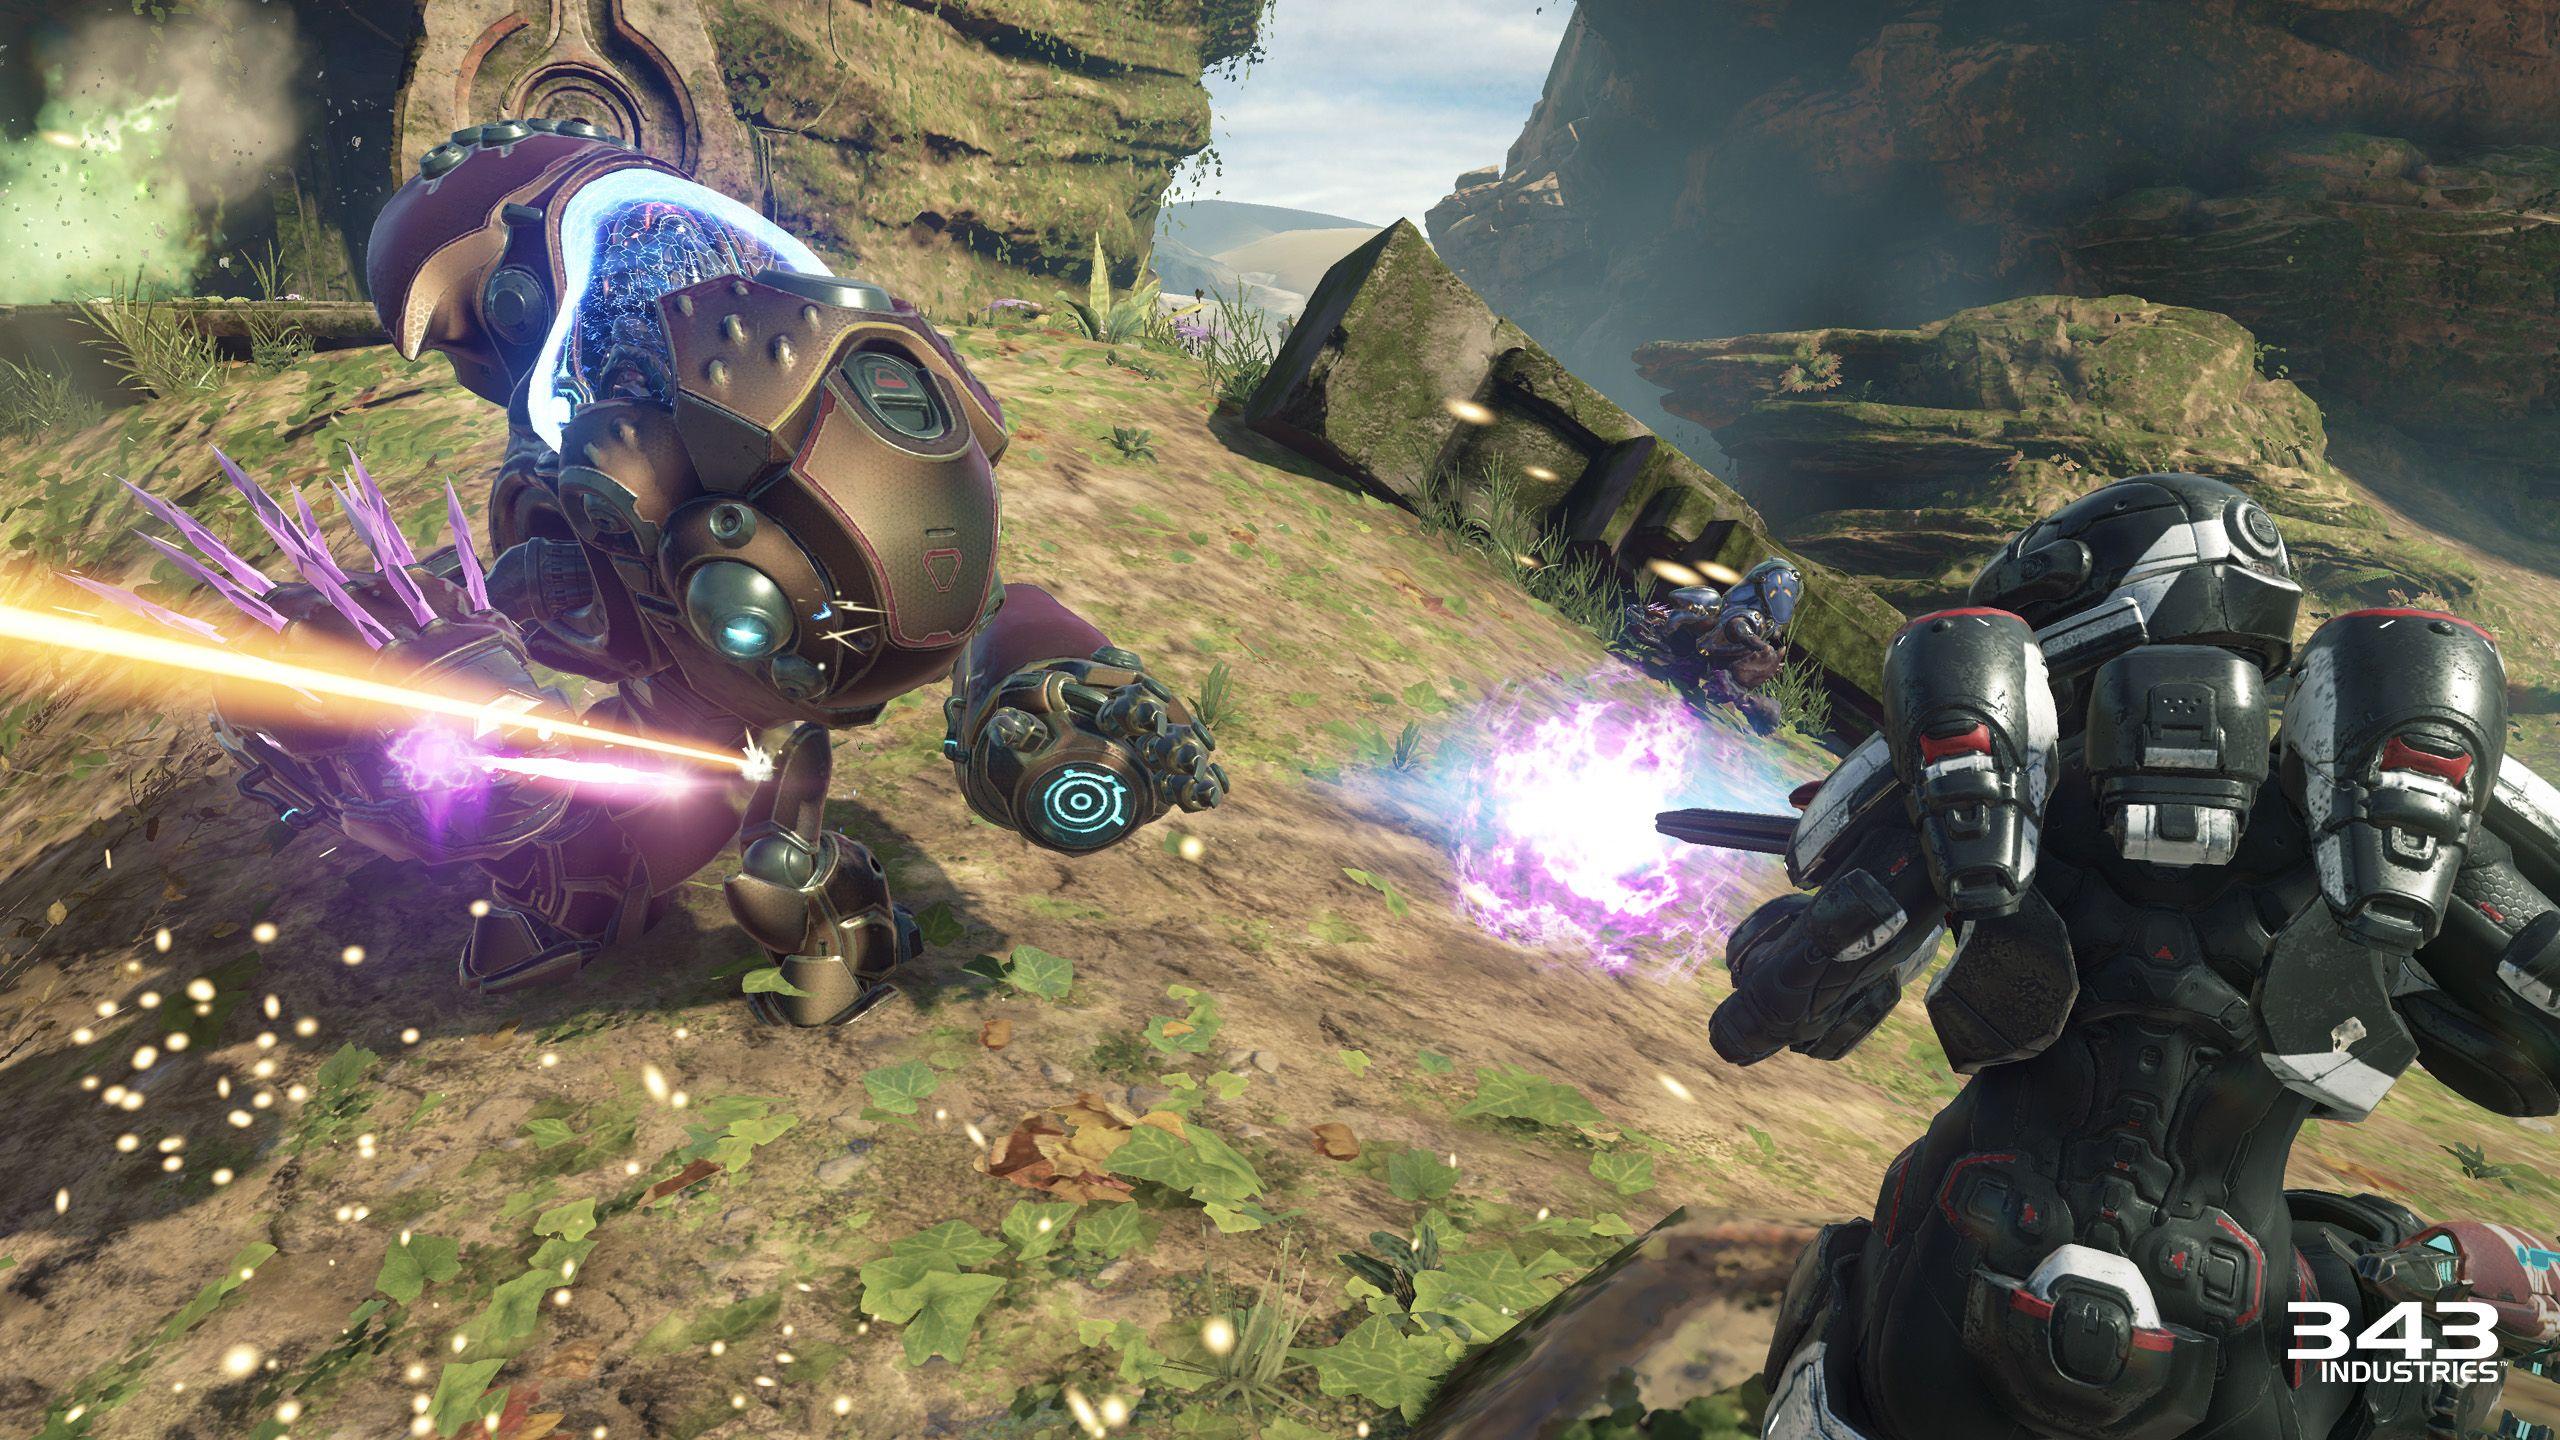 H5-Guardians-WZ-Firefight-Sanctum-Grunt-Mech-01.0